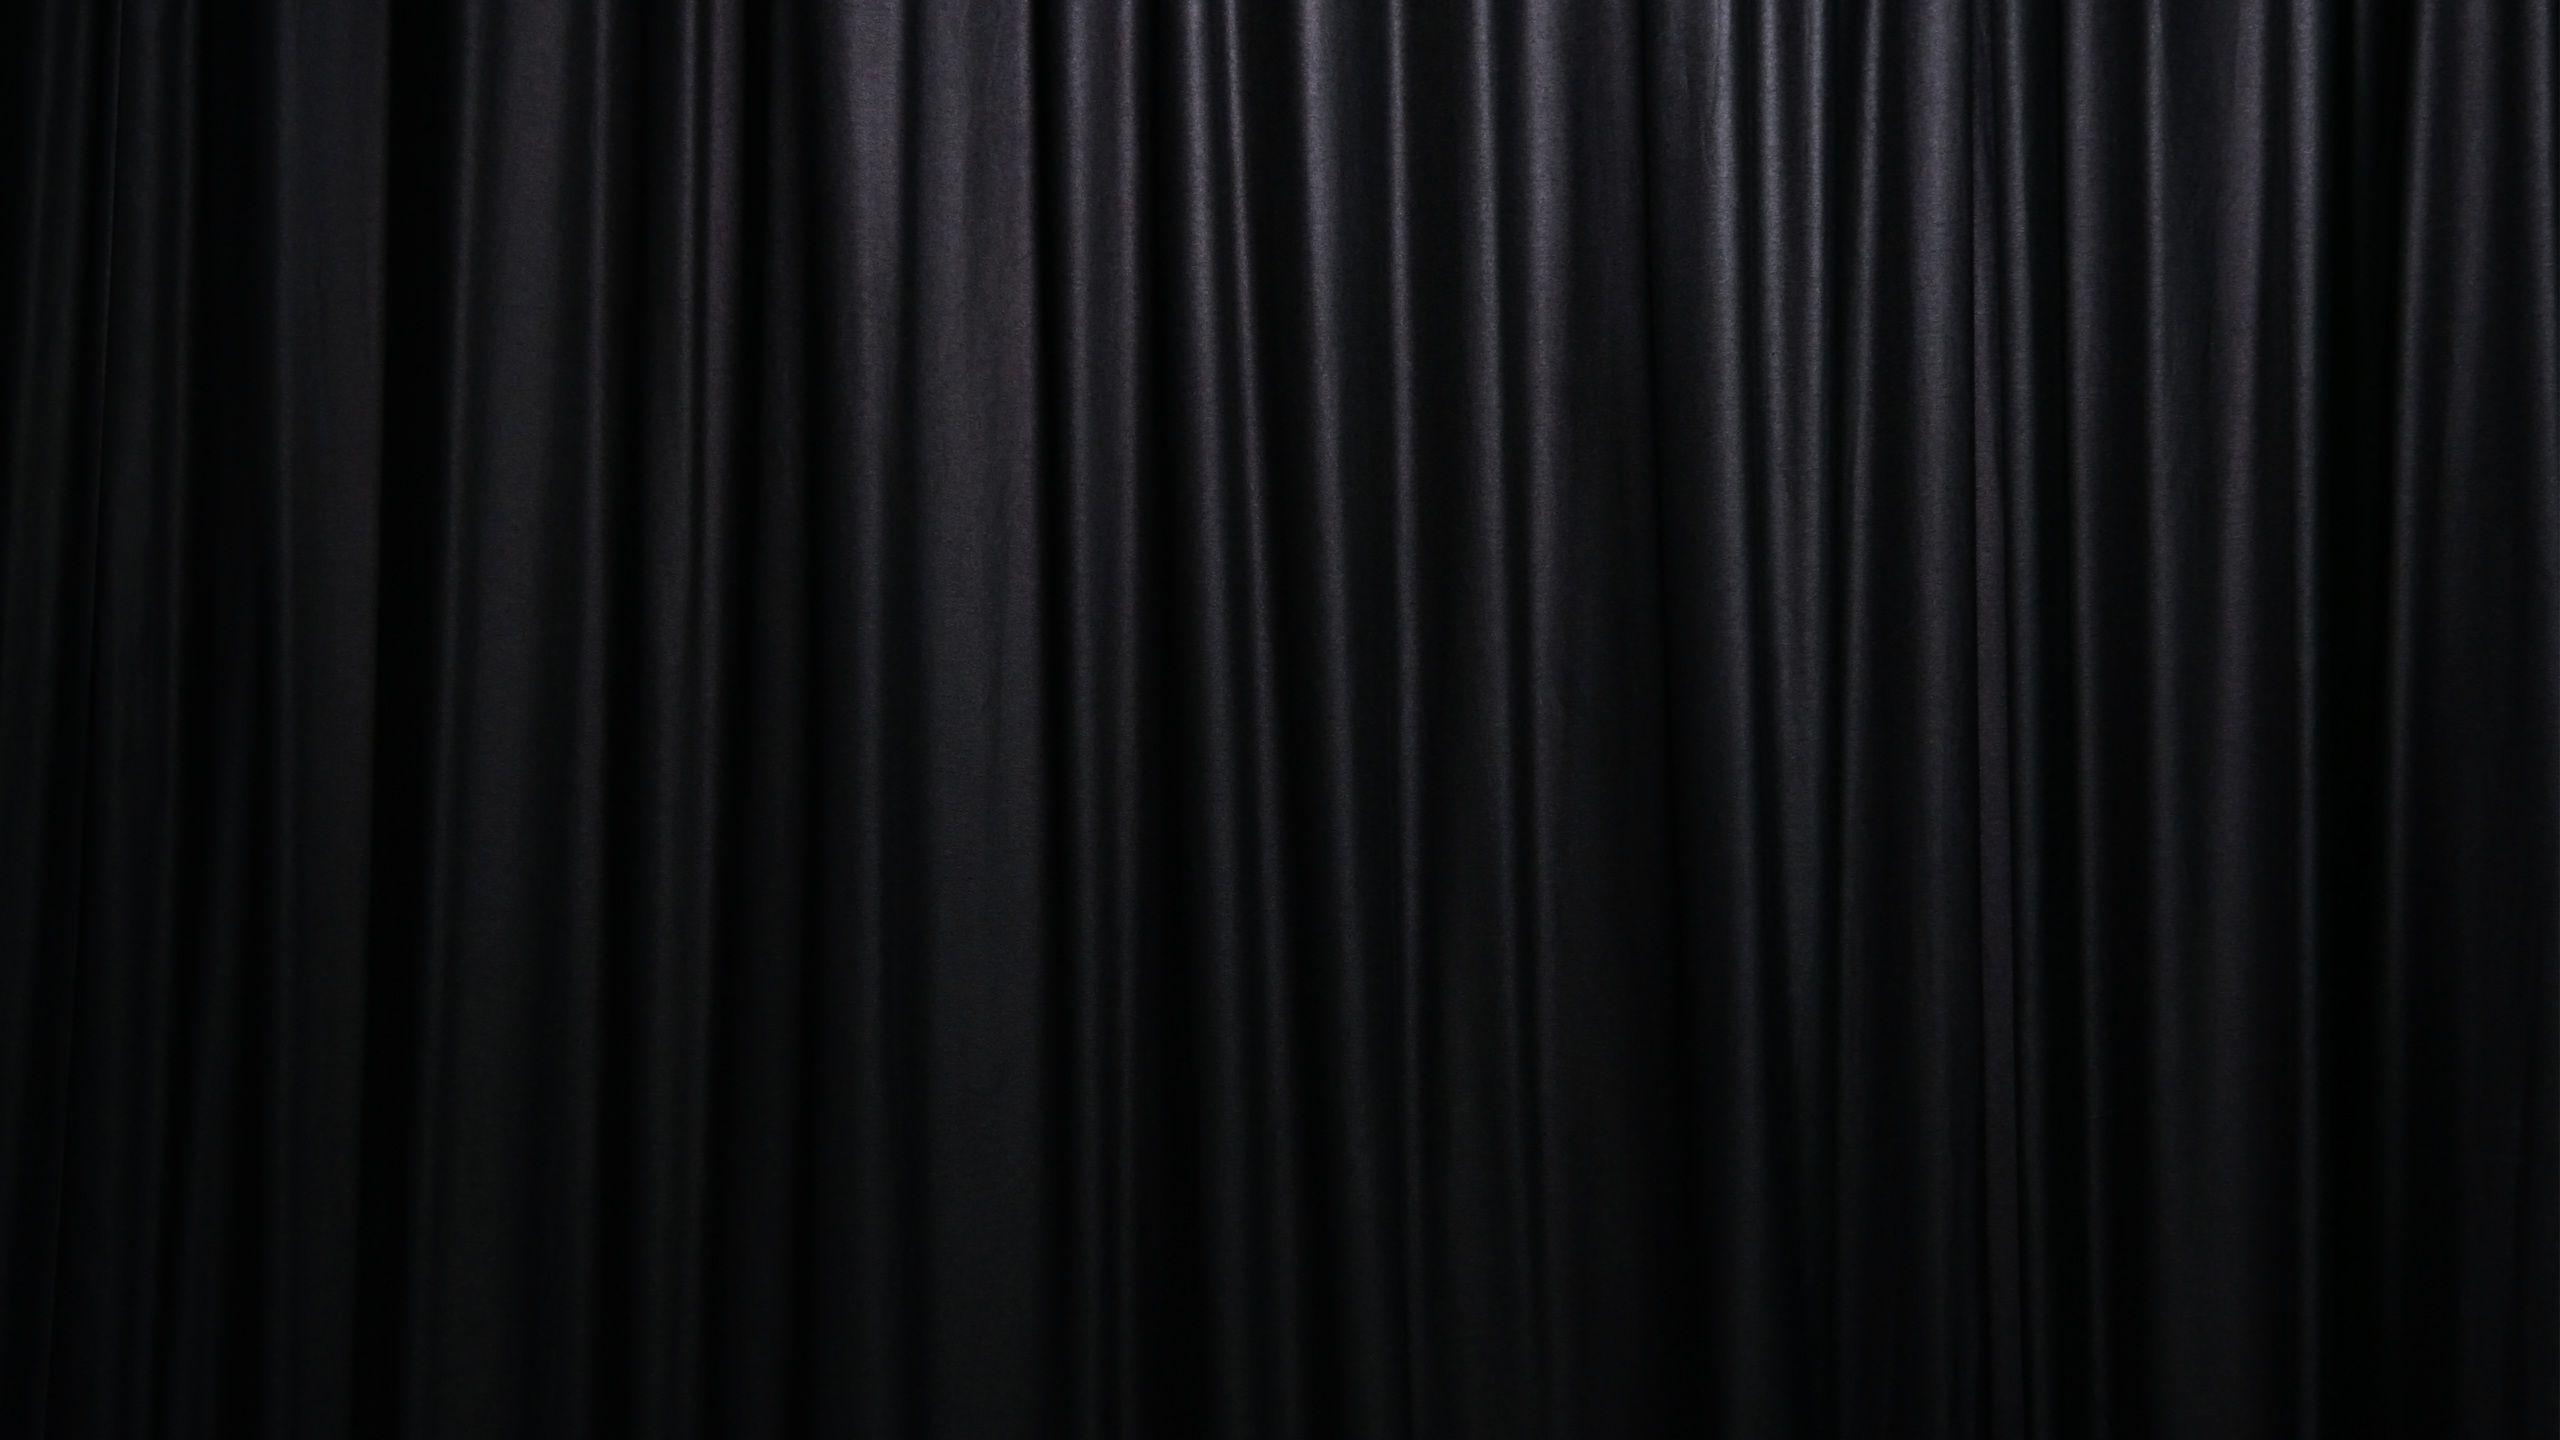 Black Curtain Wallpaper